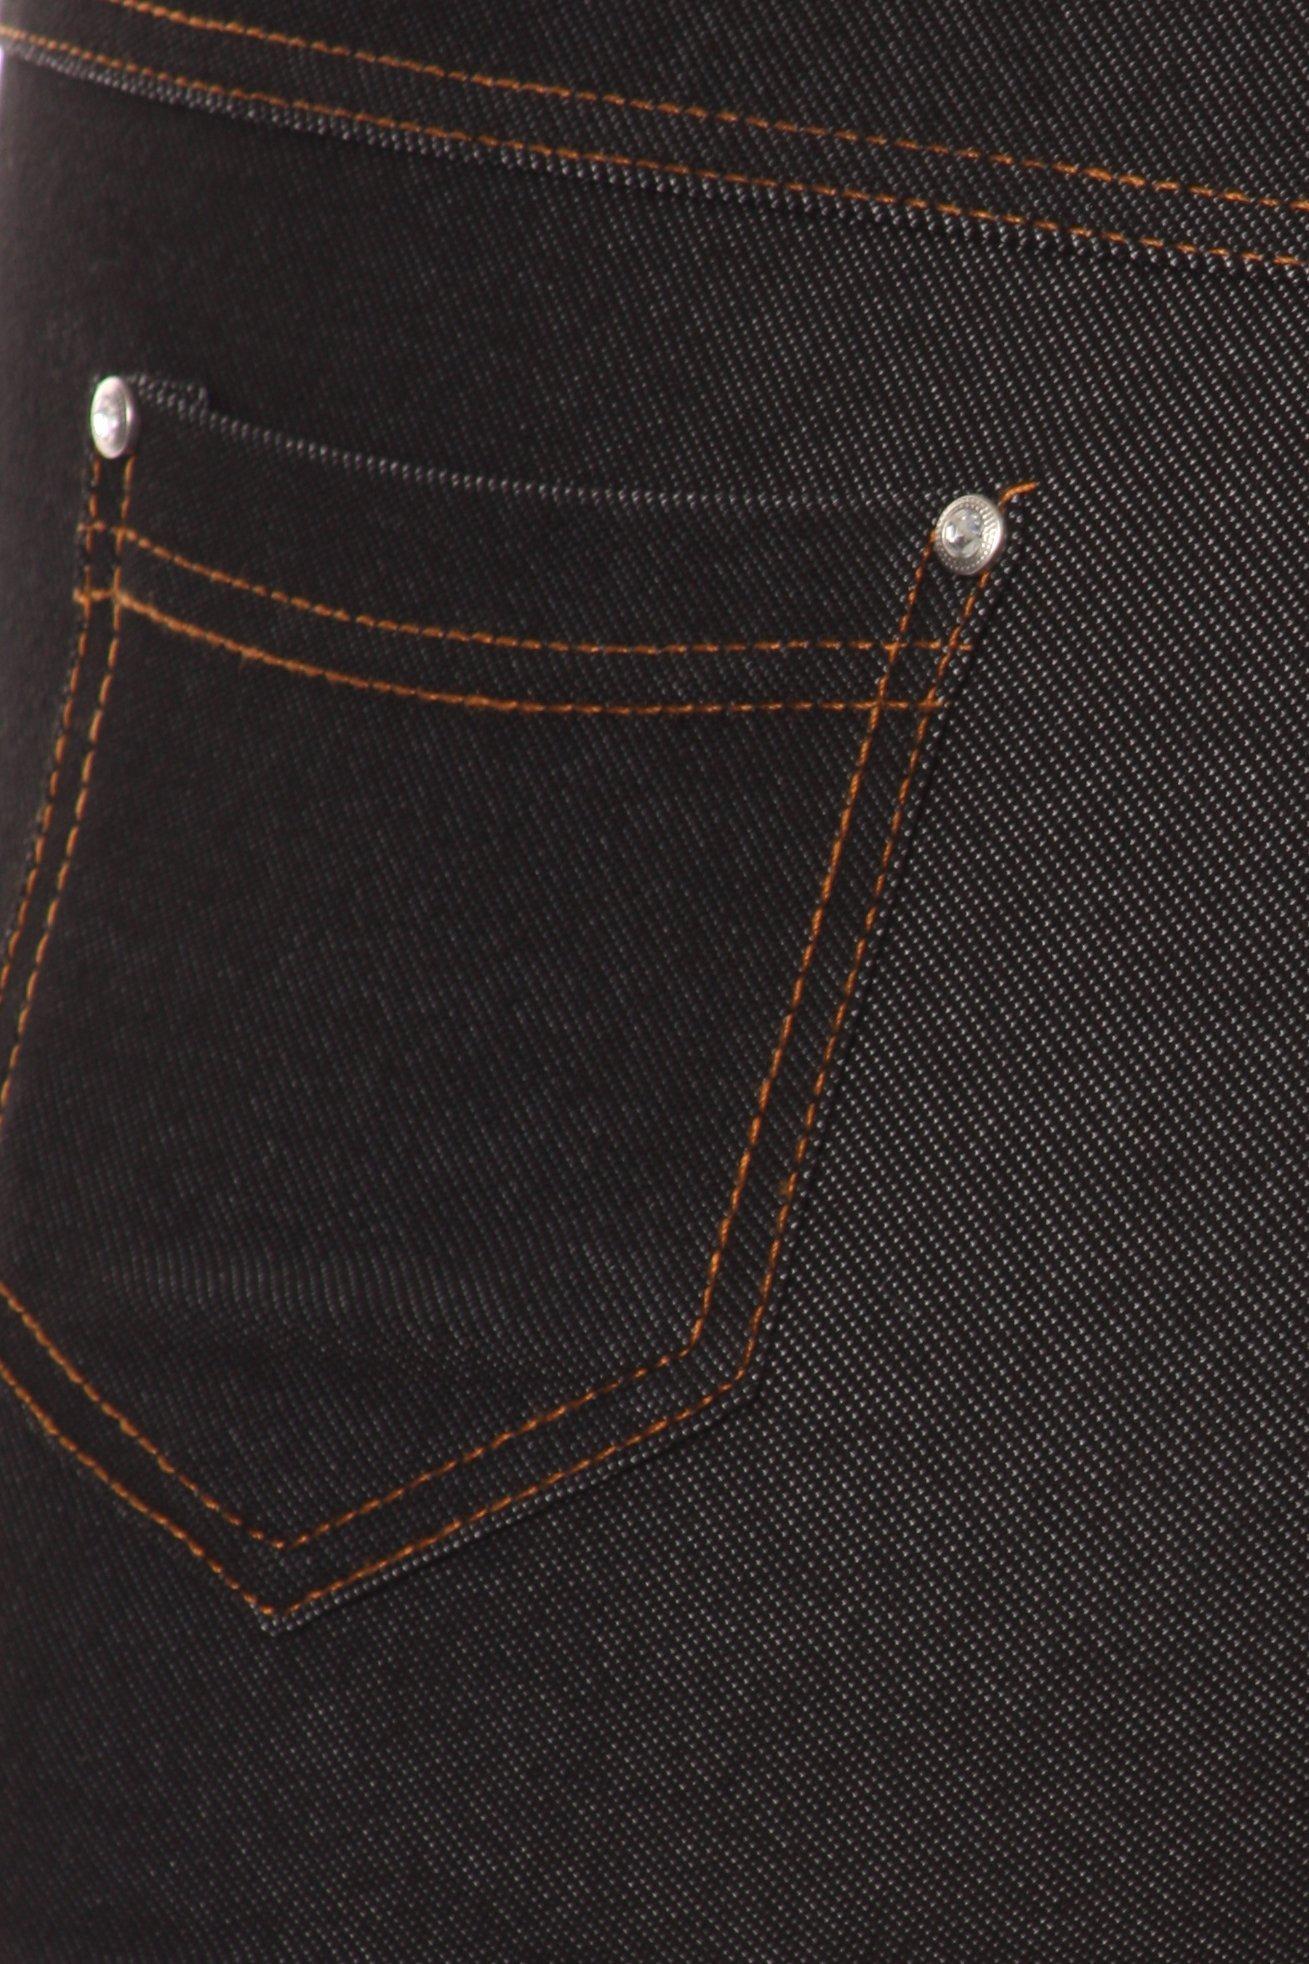 ICONOFLASH Women's Jeggings - Pull On Slimming Cotton Jean Like Leggings (Black, 2XL) by ICONOFLASH (Image #1)